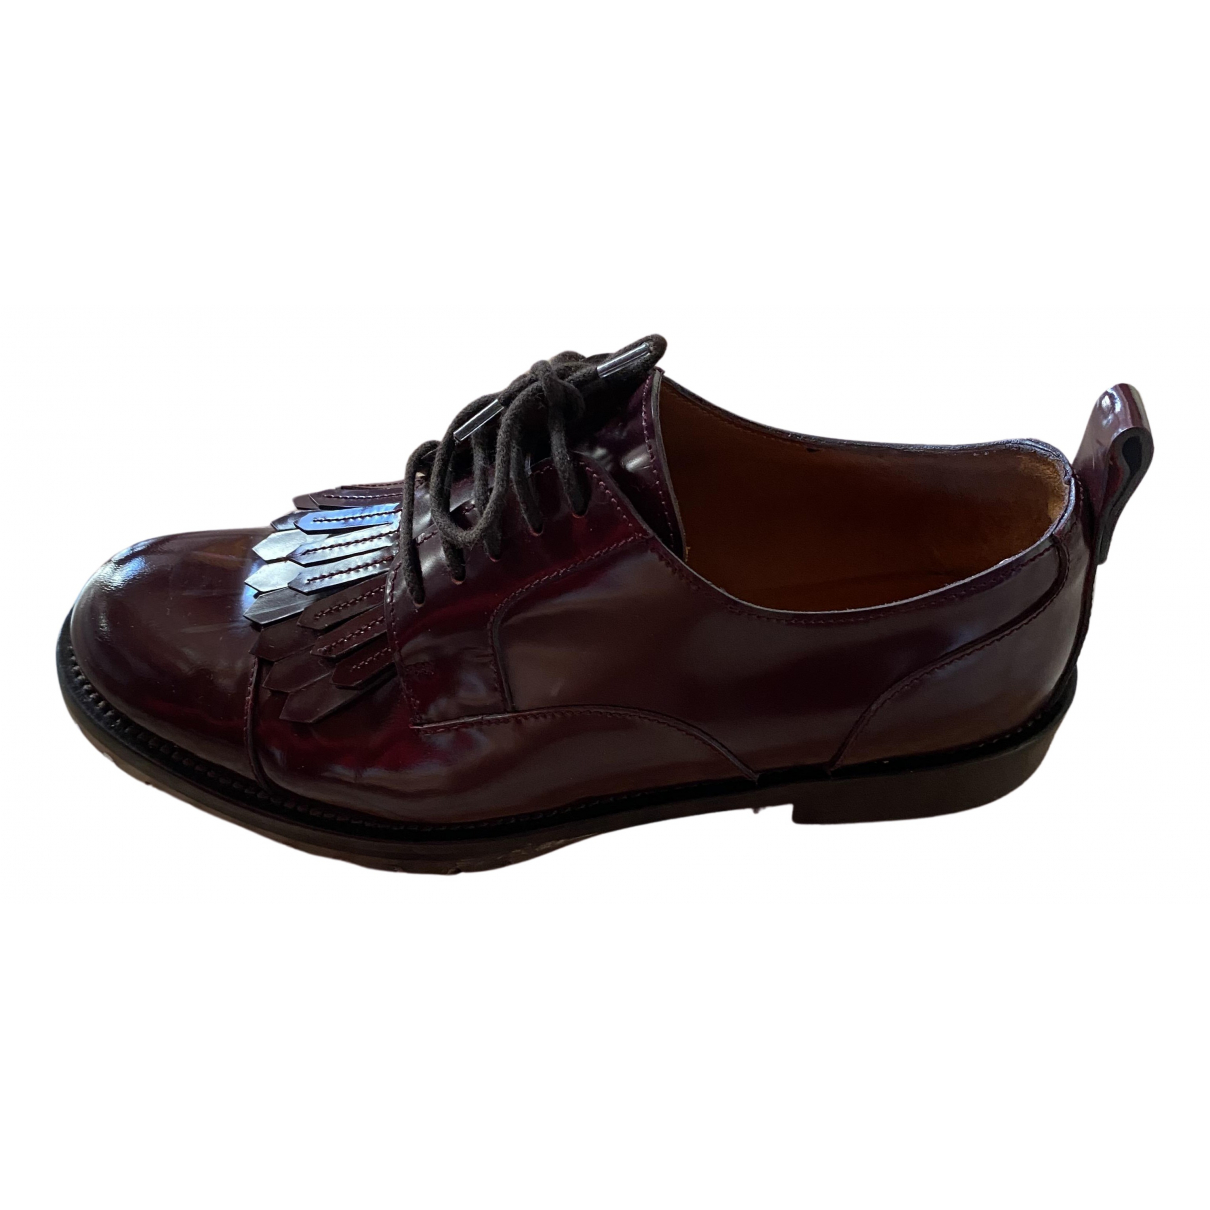 Valentino Garavani Rockstud Burgundy Leather Flats for Women 37 EU